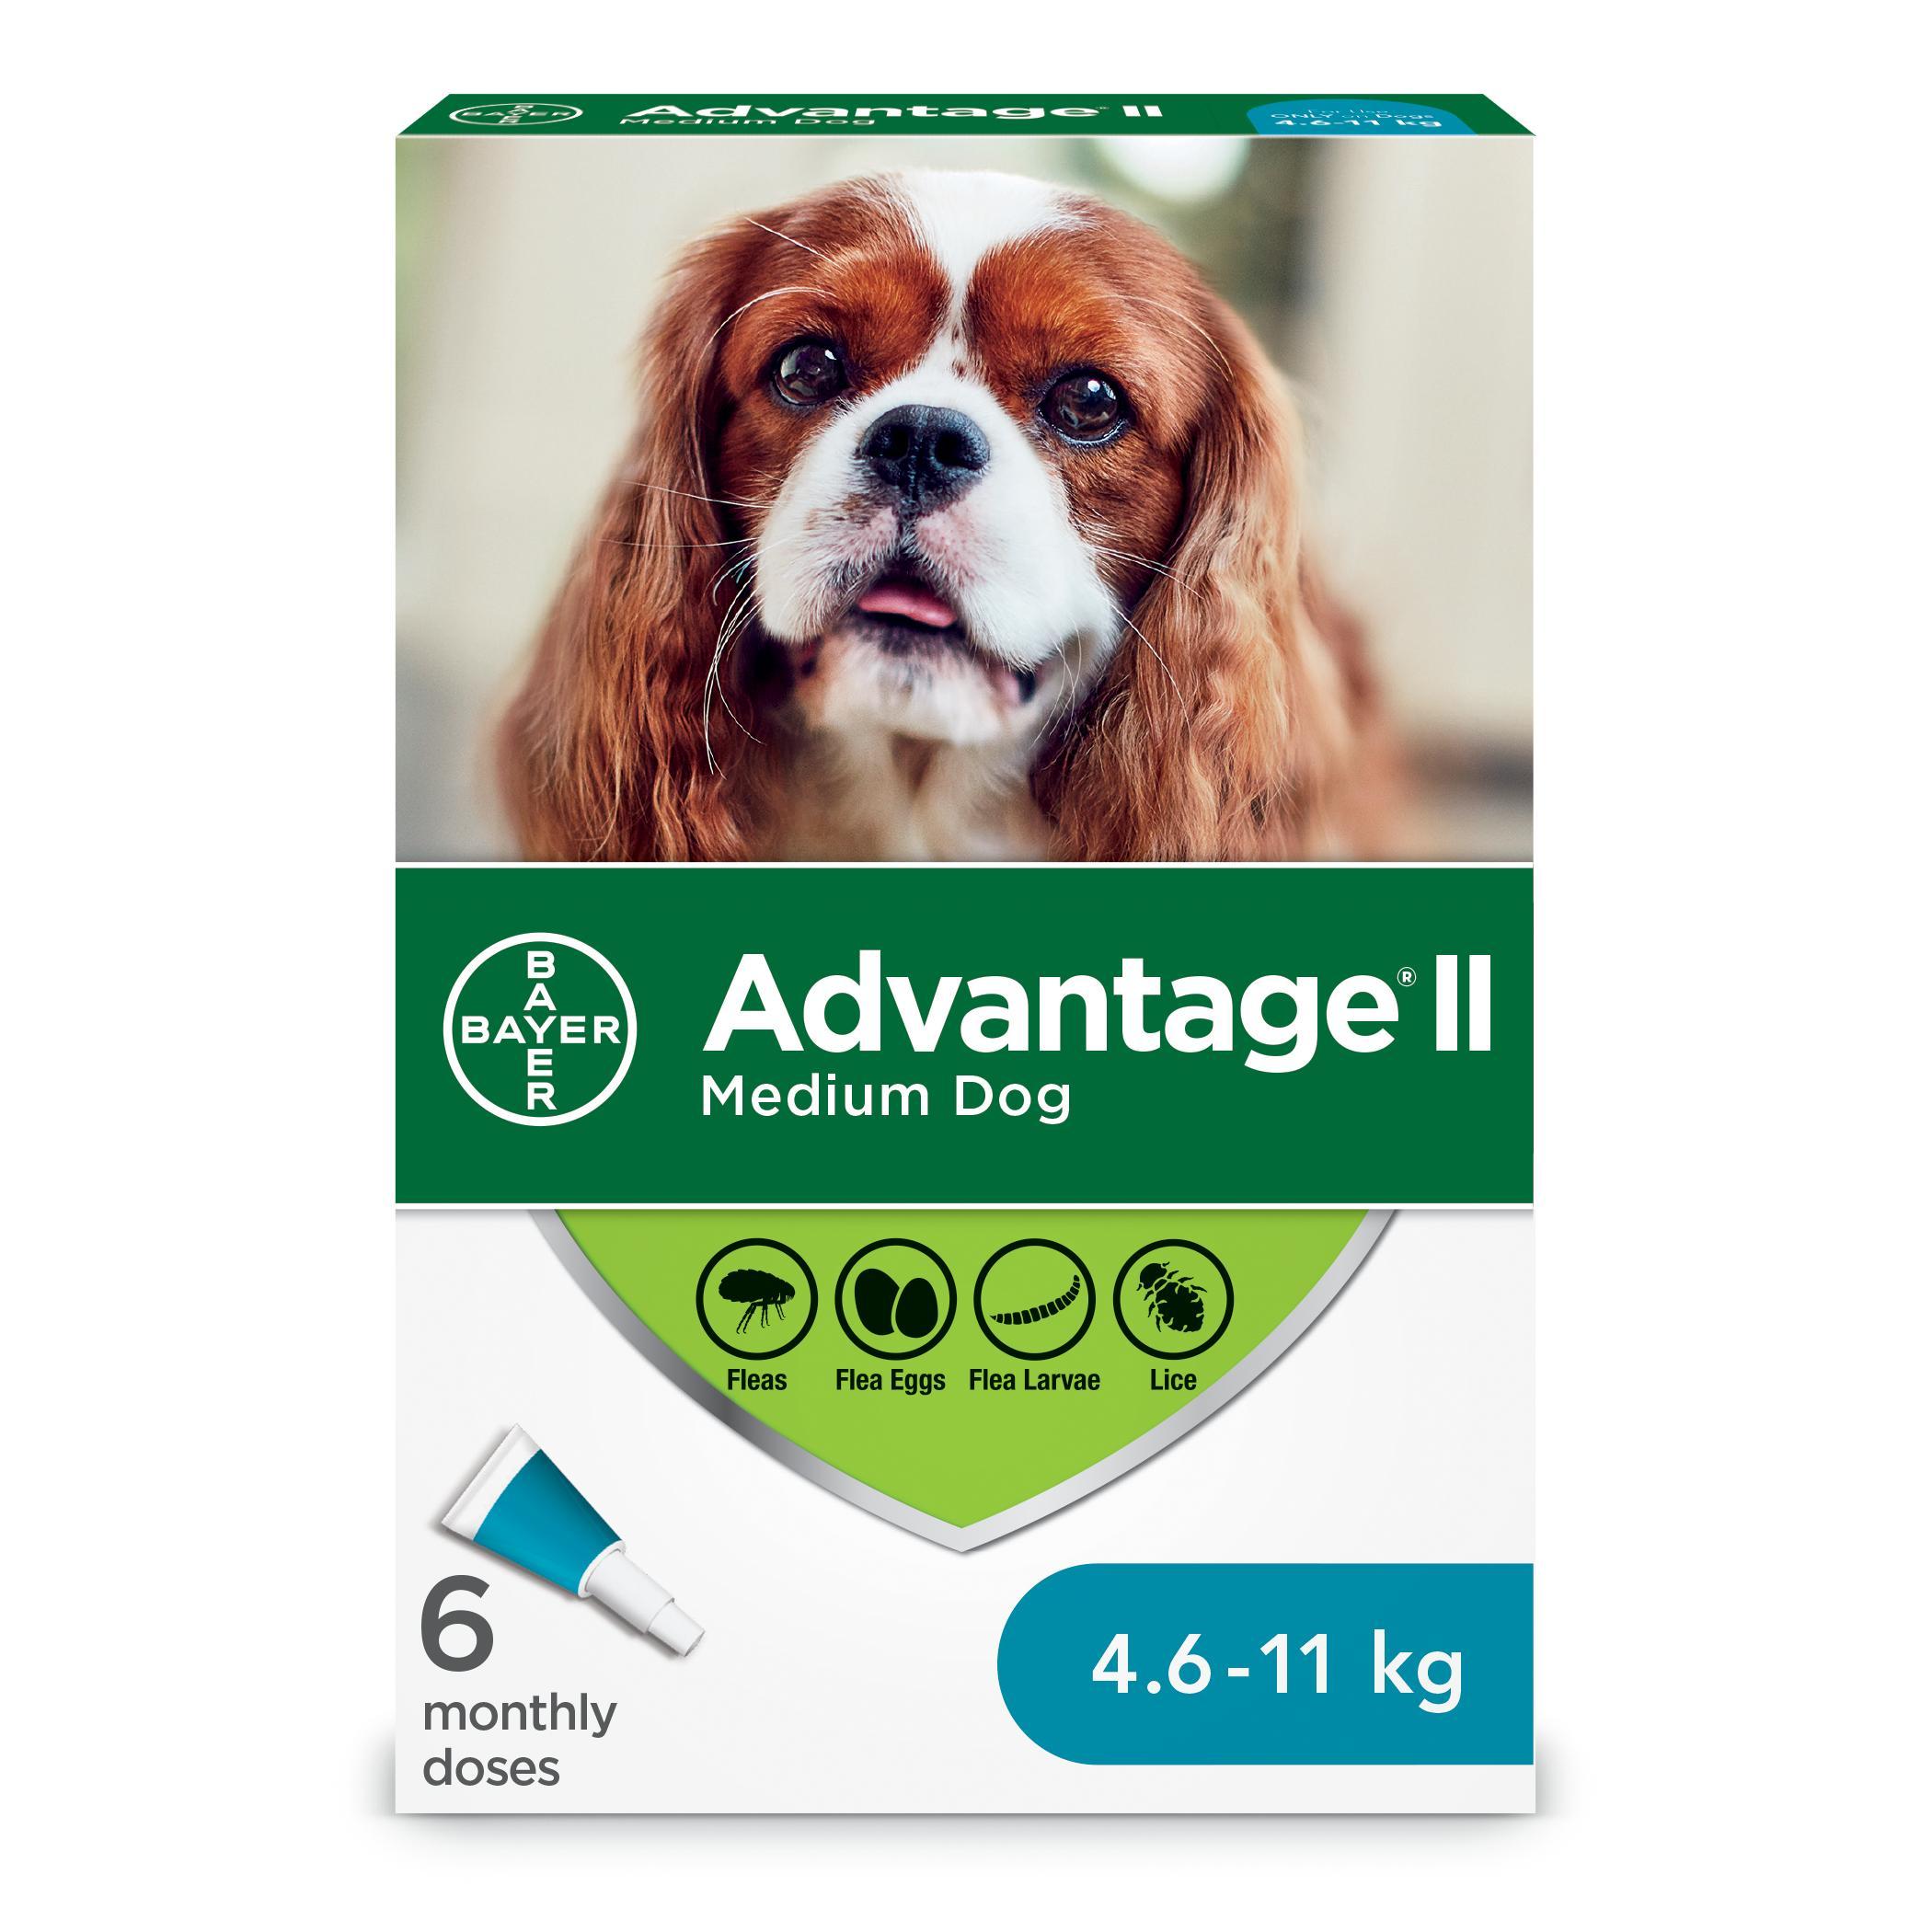 Bayer Advantage II Flea Protection for Medium Dogs 4.6-11-kg, 6-pk